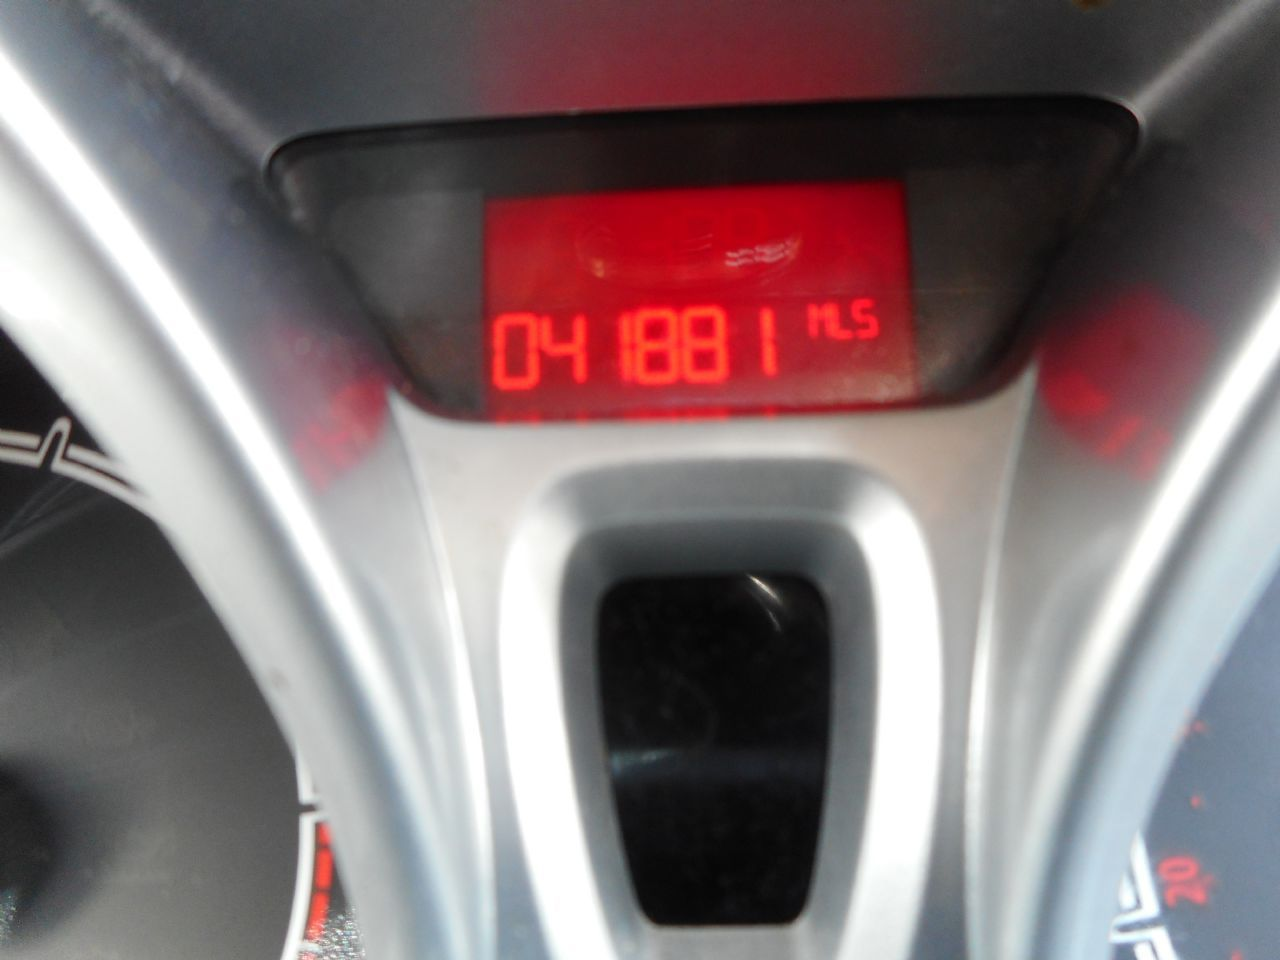 FORD Fiesta Titanium 1.4 096 Auto (2012) - Picture 13